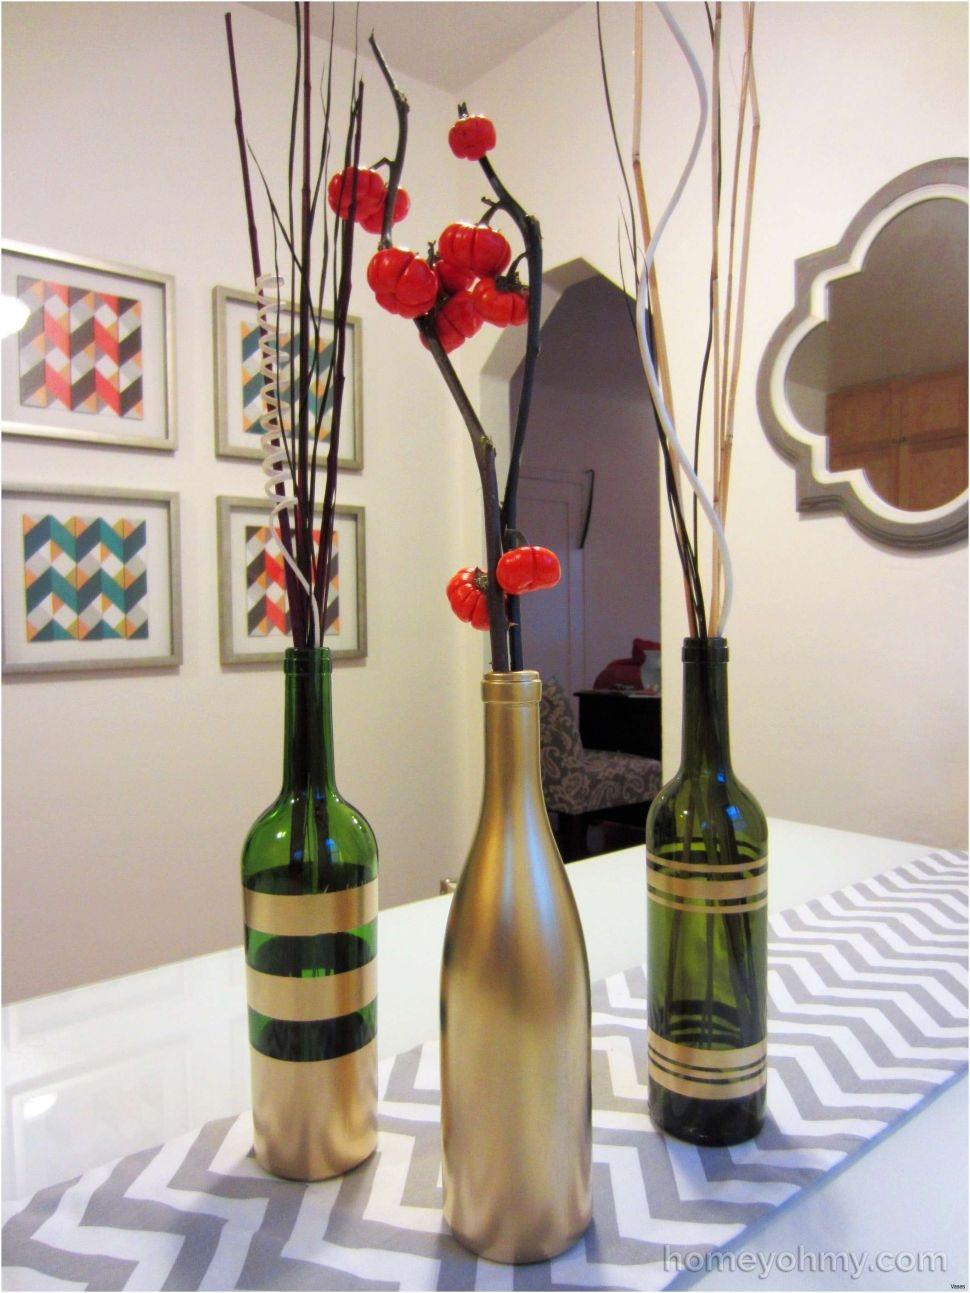 16 Cute Wine Bottle Vase Centerpieces 2021 free download wine bottle vase centerpieces of 27 decoration ideas with glass bottles decoration ideas galleries regarding decoration ideas with glass bottles 21 unique wine gift basket ideas